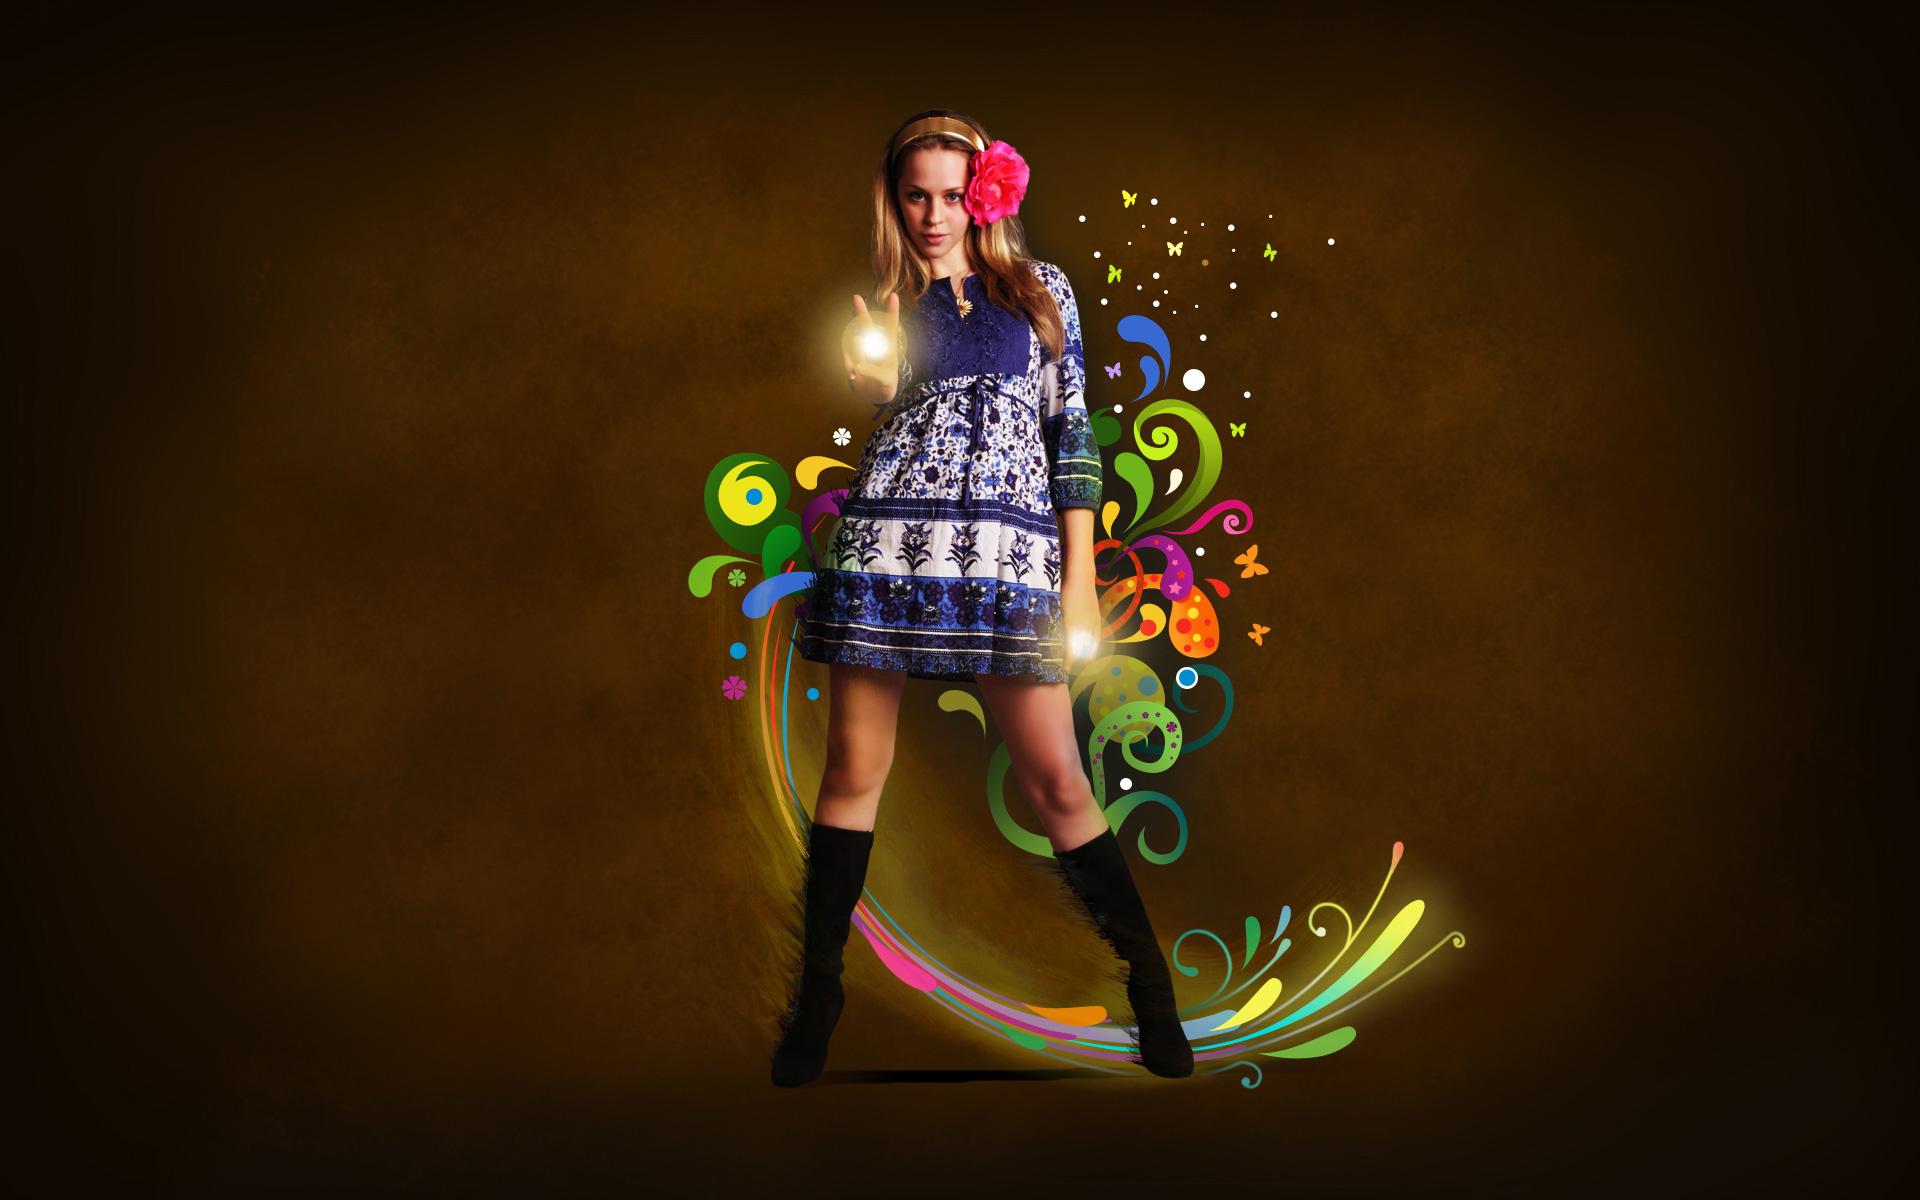 Photoshop wallpaper   37678 1920x1200